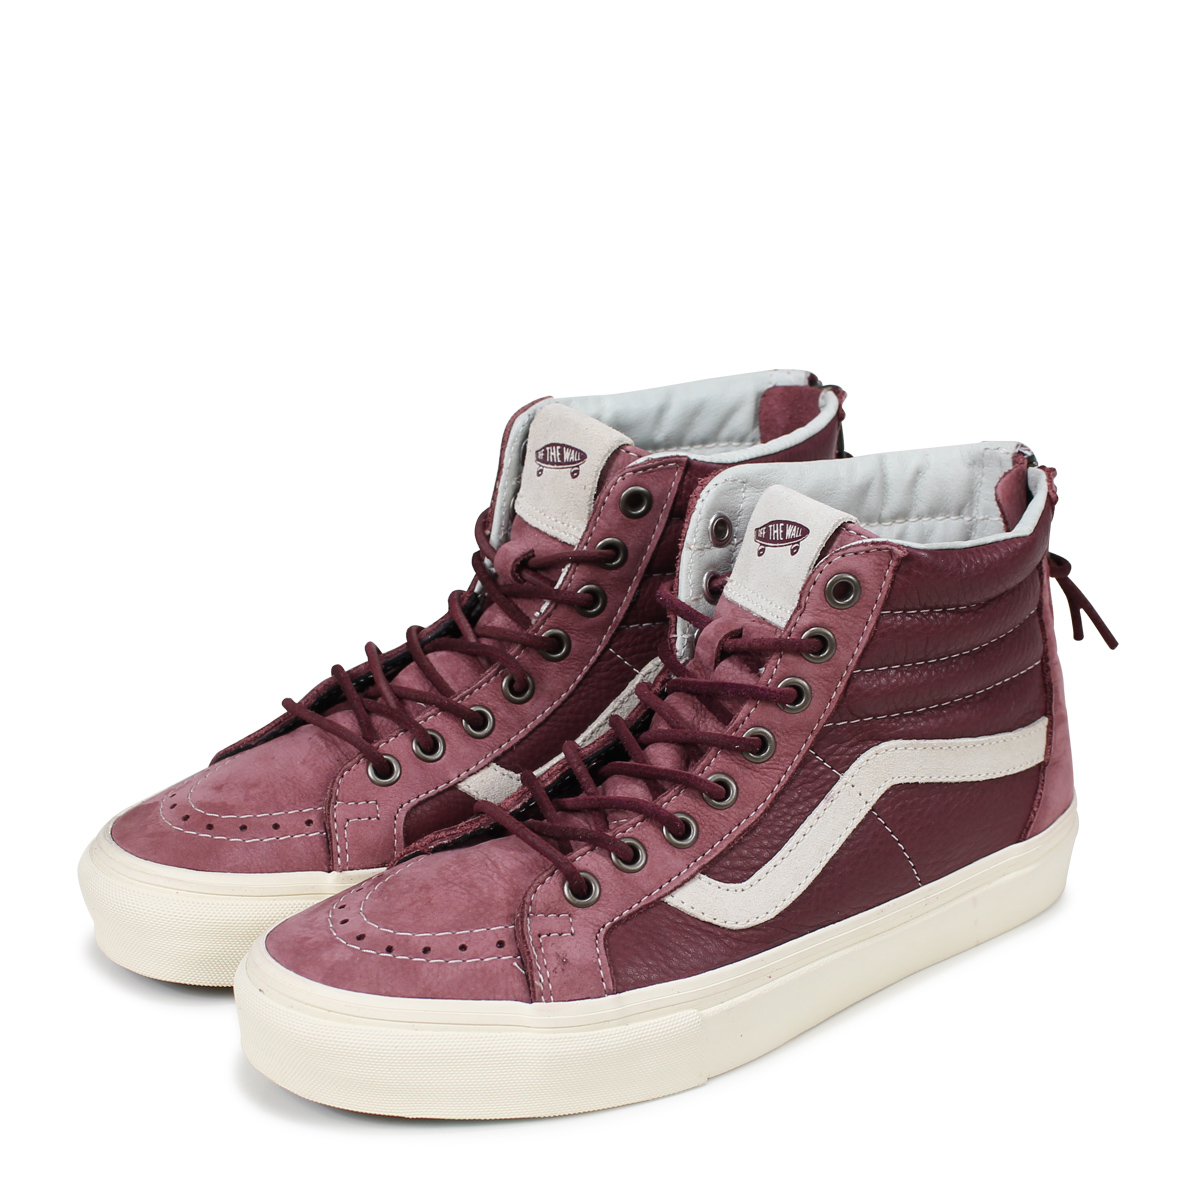 3ba6646a12 ALLSPORTS  VANS SK8-HI VAULT REISSUE ZIP LX sneakers men vans ...